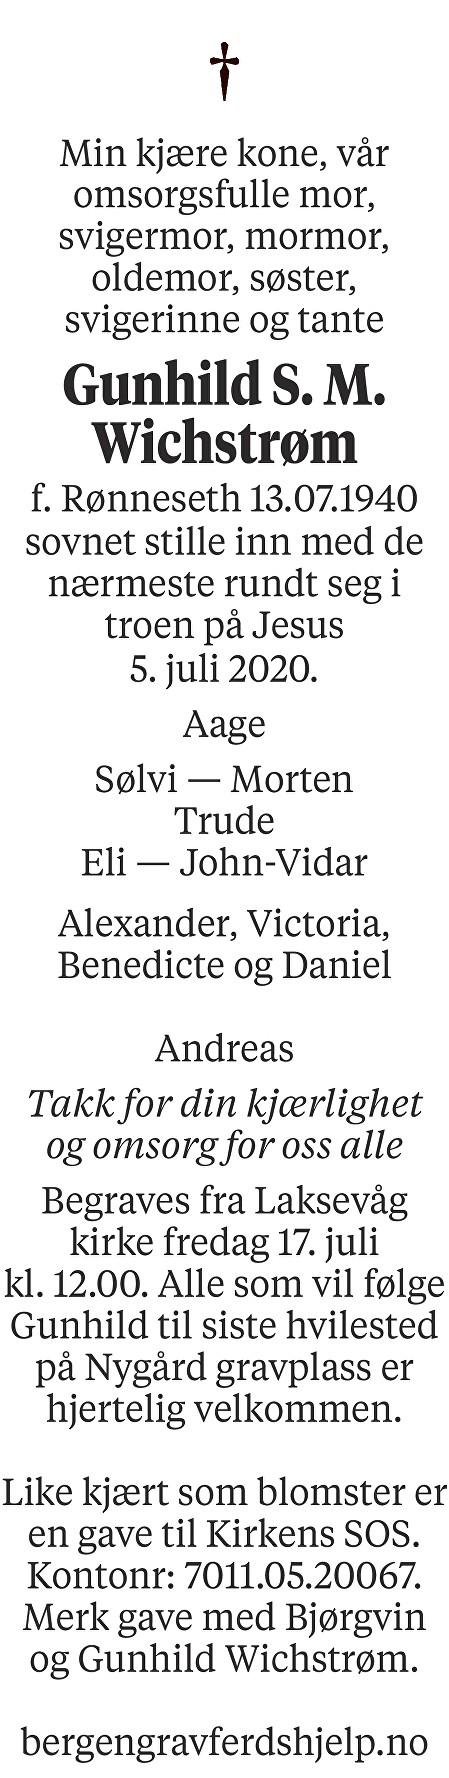 Gunhild S. M.  Wichstrøm Dødsannonse